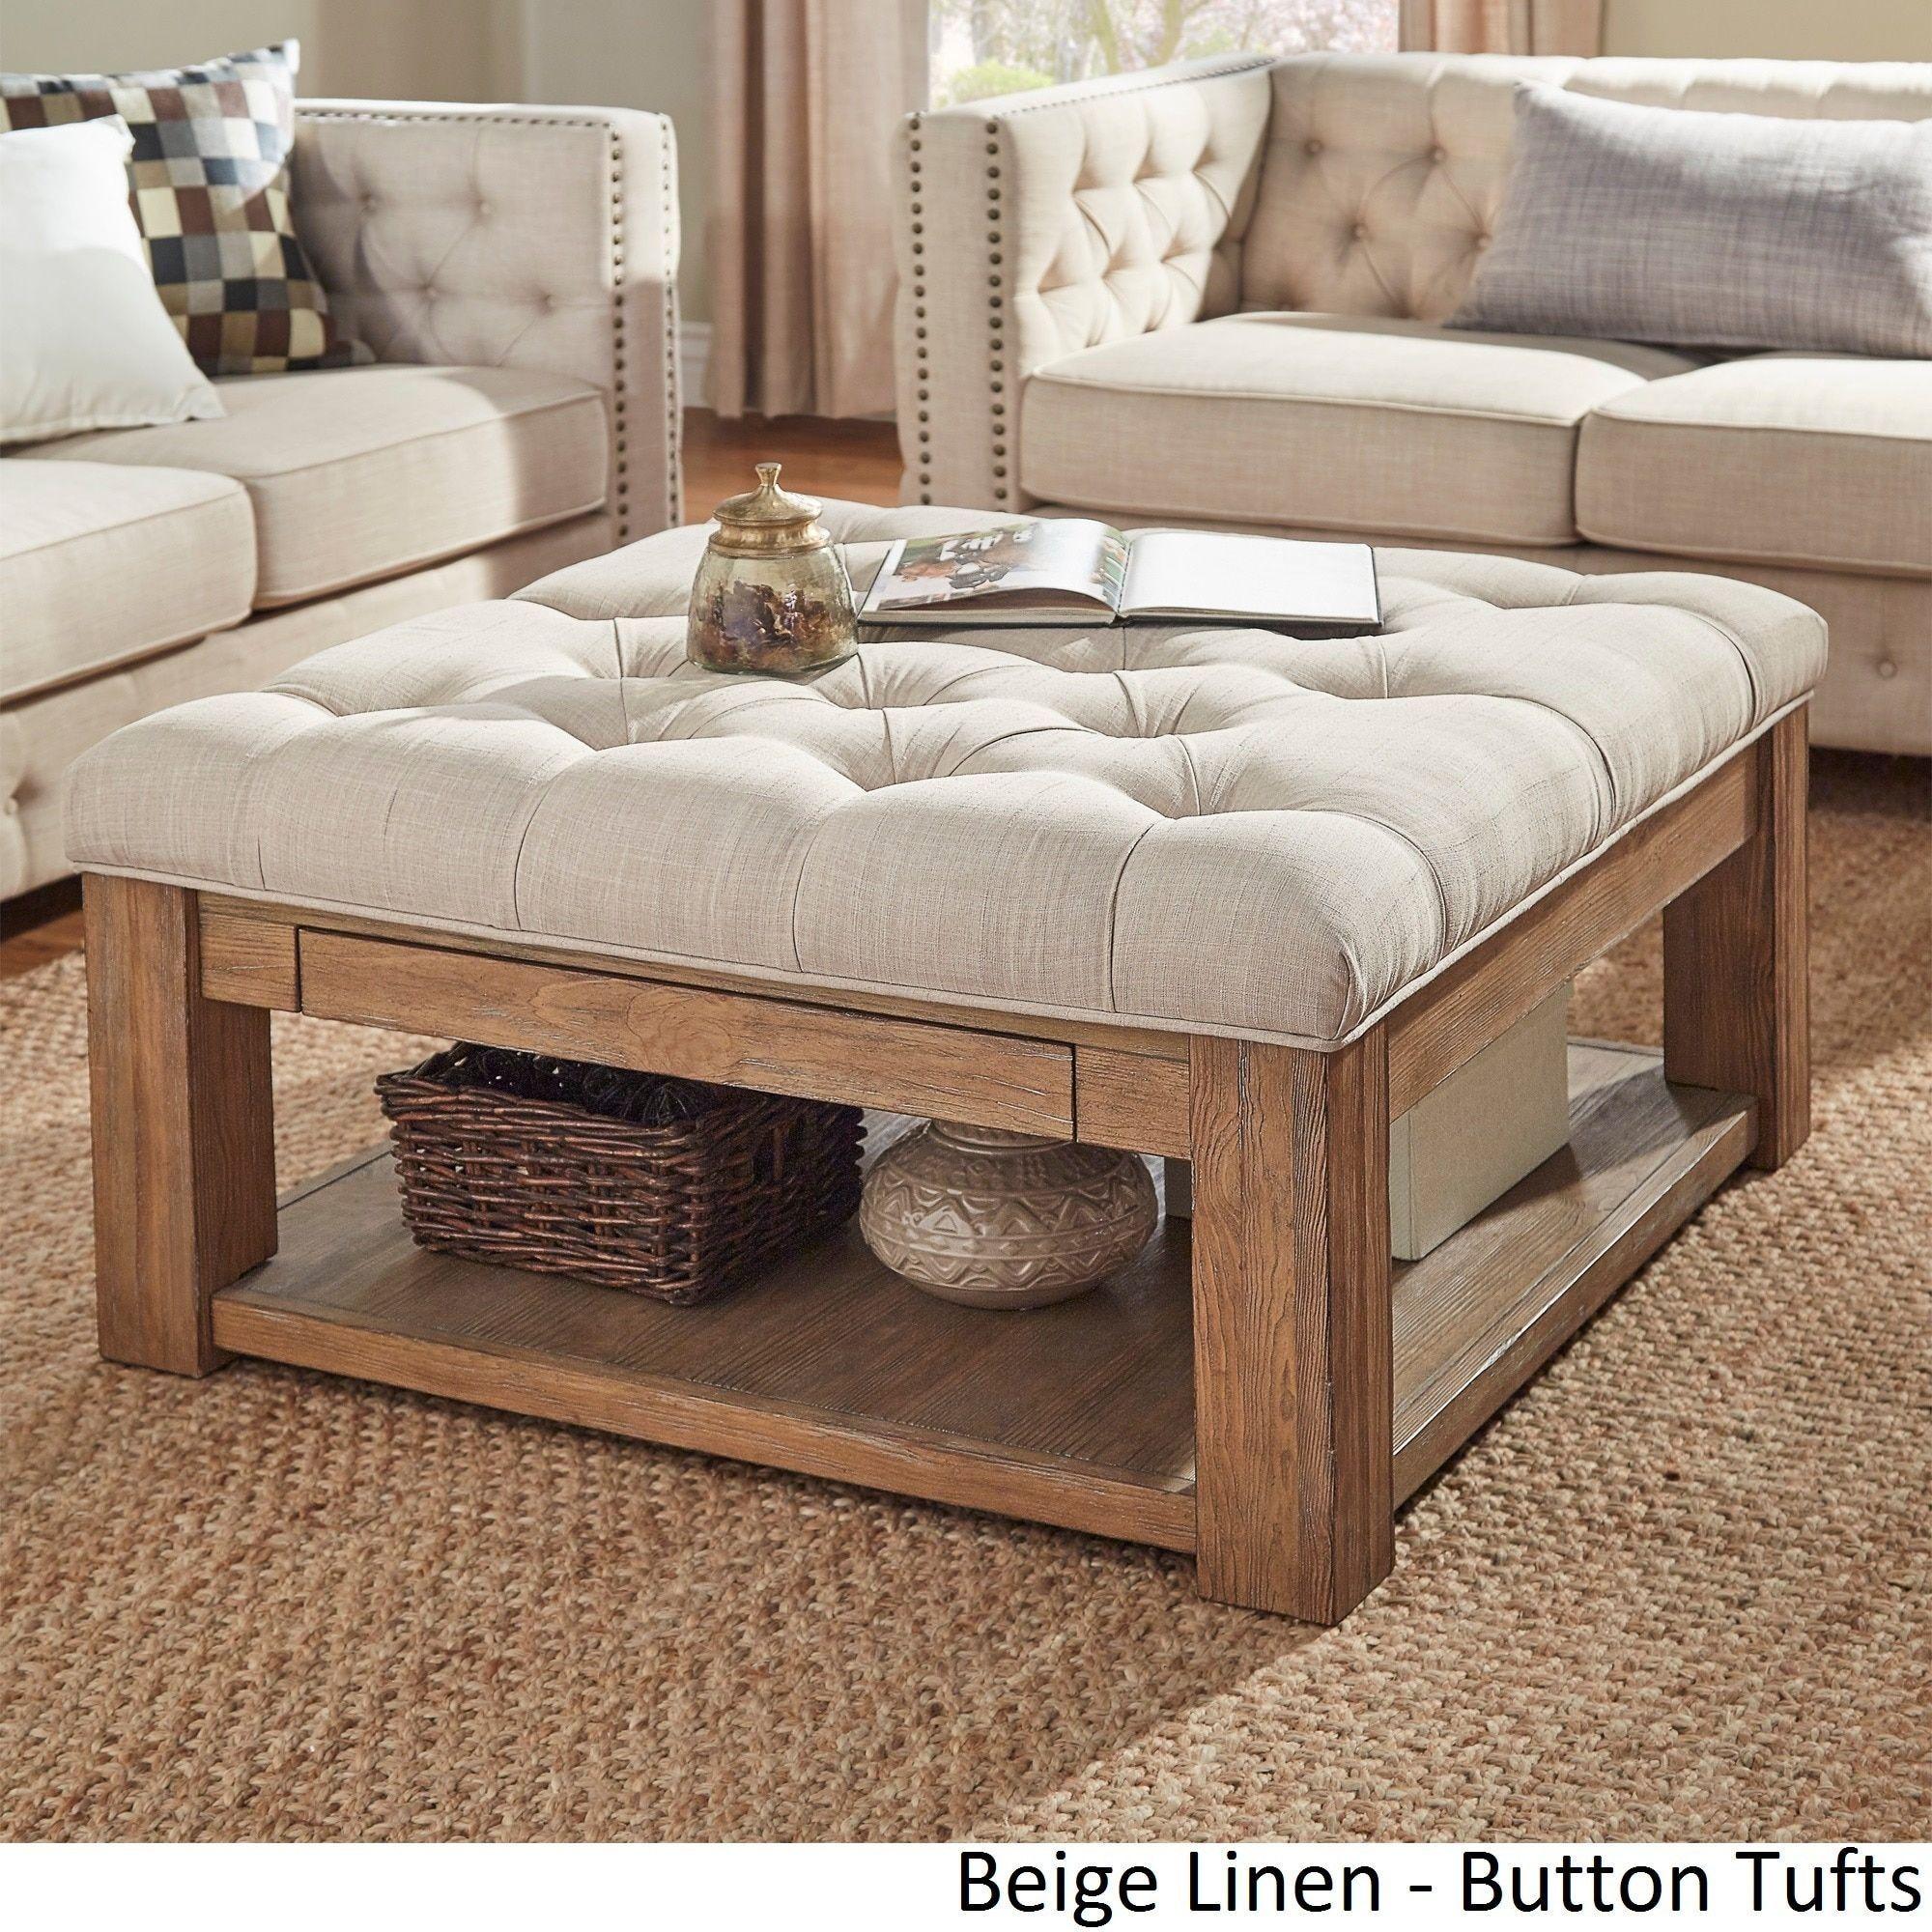 Lennon Pine Square Storage Ottoman Coffee Table Inspire Q Artisan within sizing 2000 X 2000